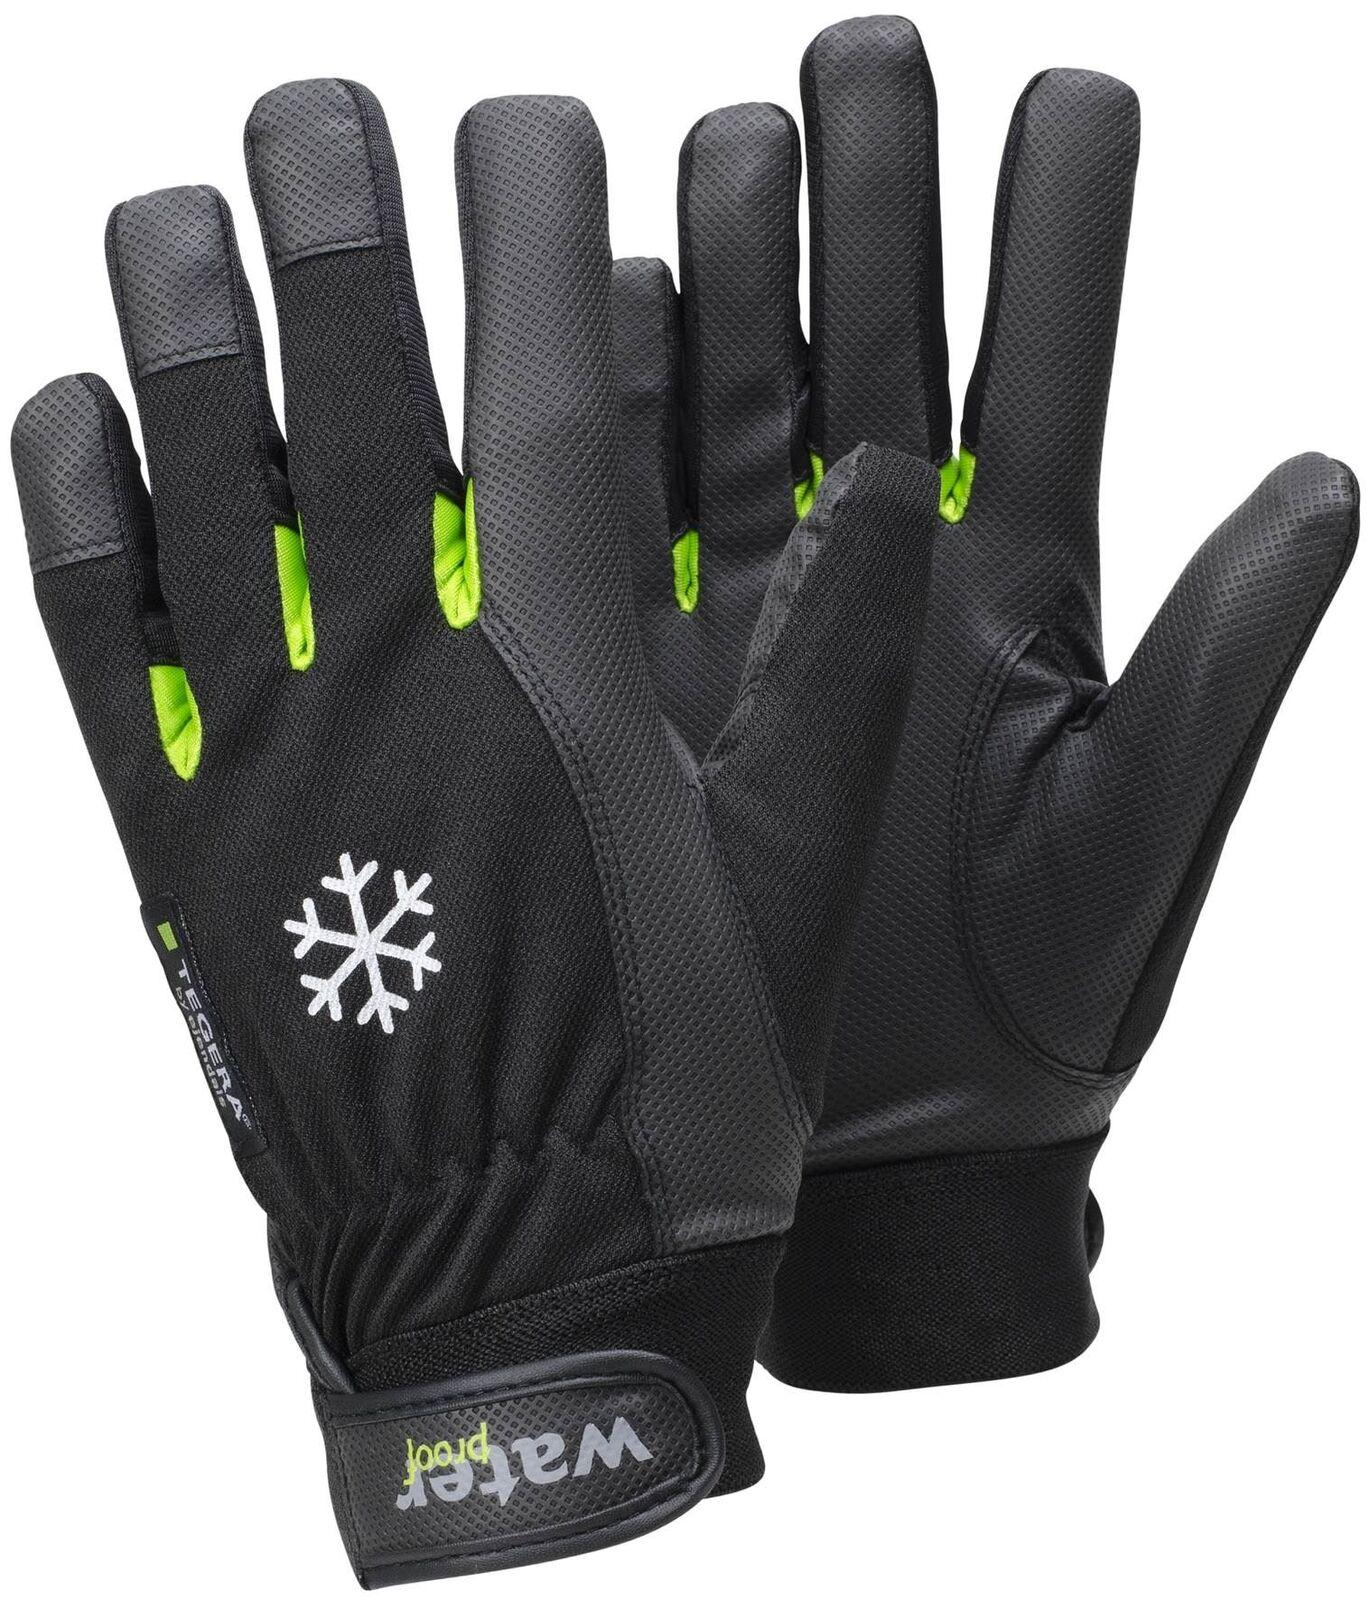 1 Pair Tegera 517 Warm Winter Fleece Lined Thermal Waterproof Glove Size 9 Large